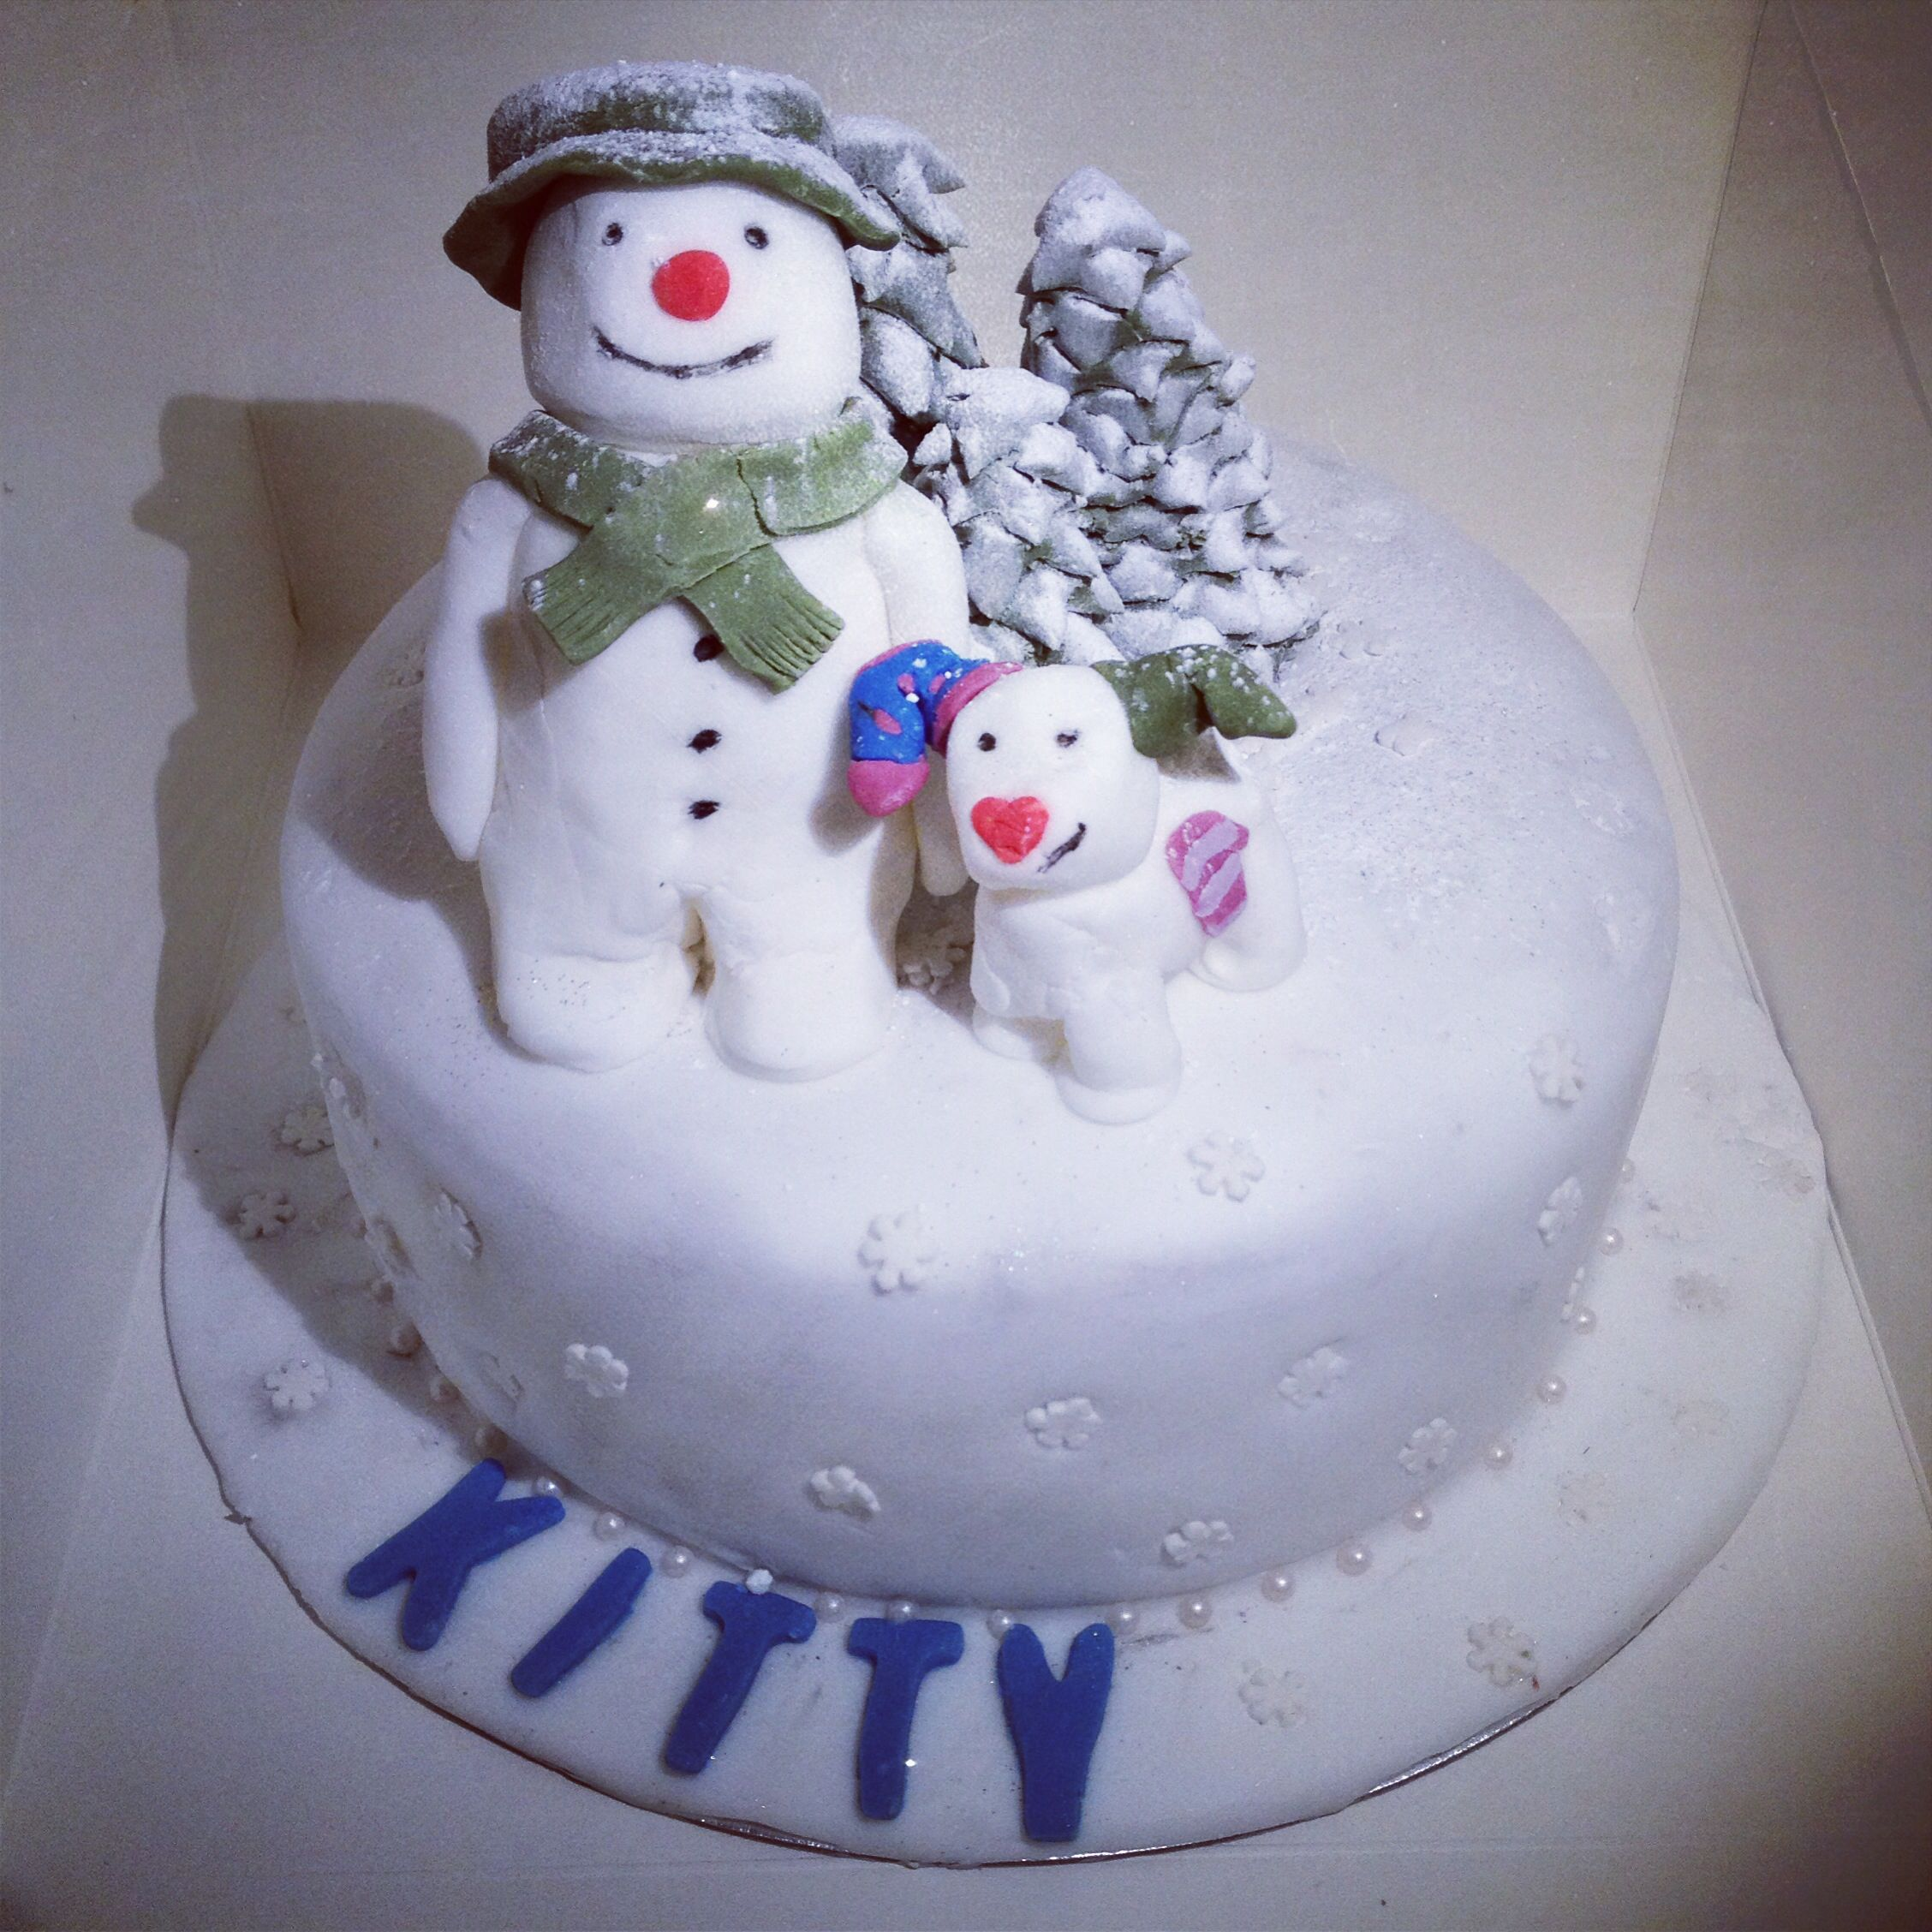 Raymond Briggs The Snowman Christmas Tree Decorations: Snowman And Snowdog Cake